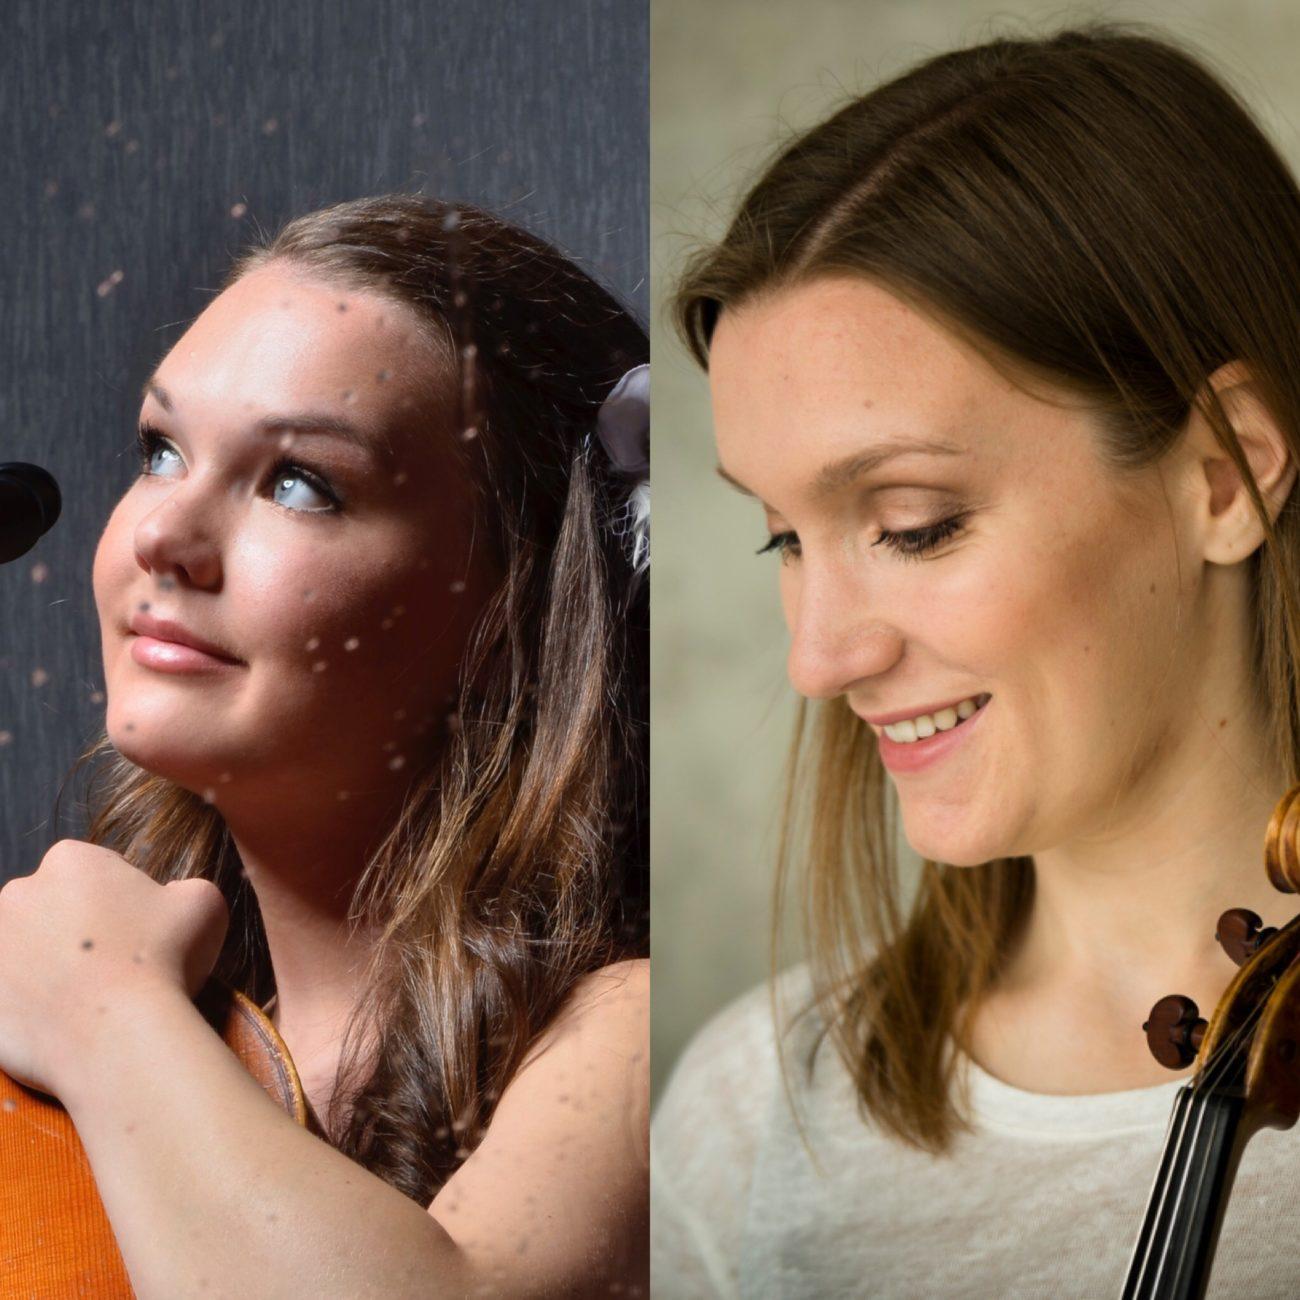 Klassisk konsert med Sandra Lied Haga og Guro Kleven Hagen